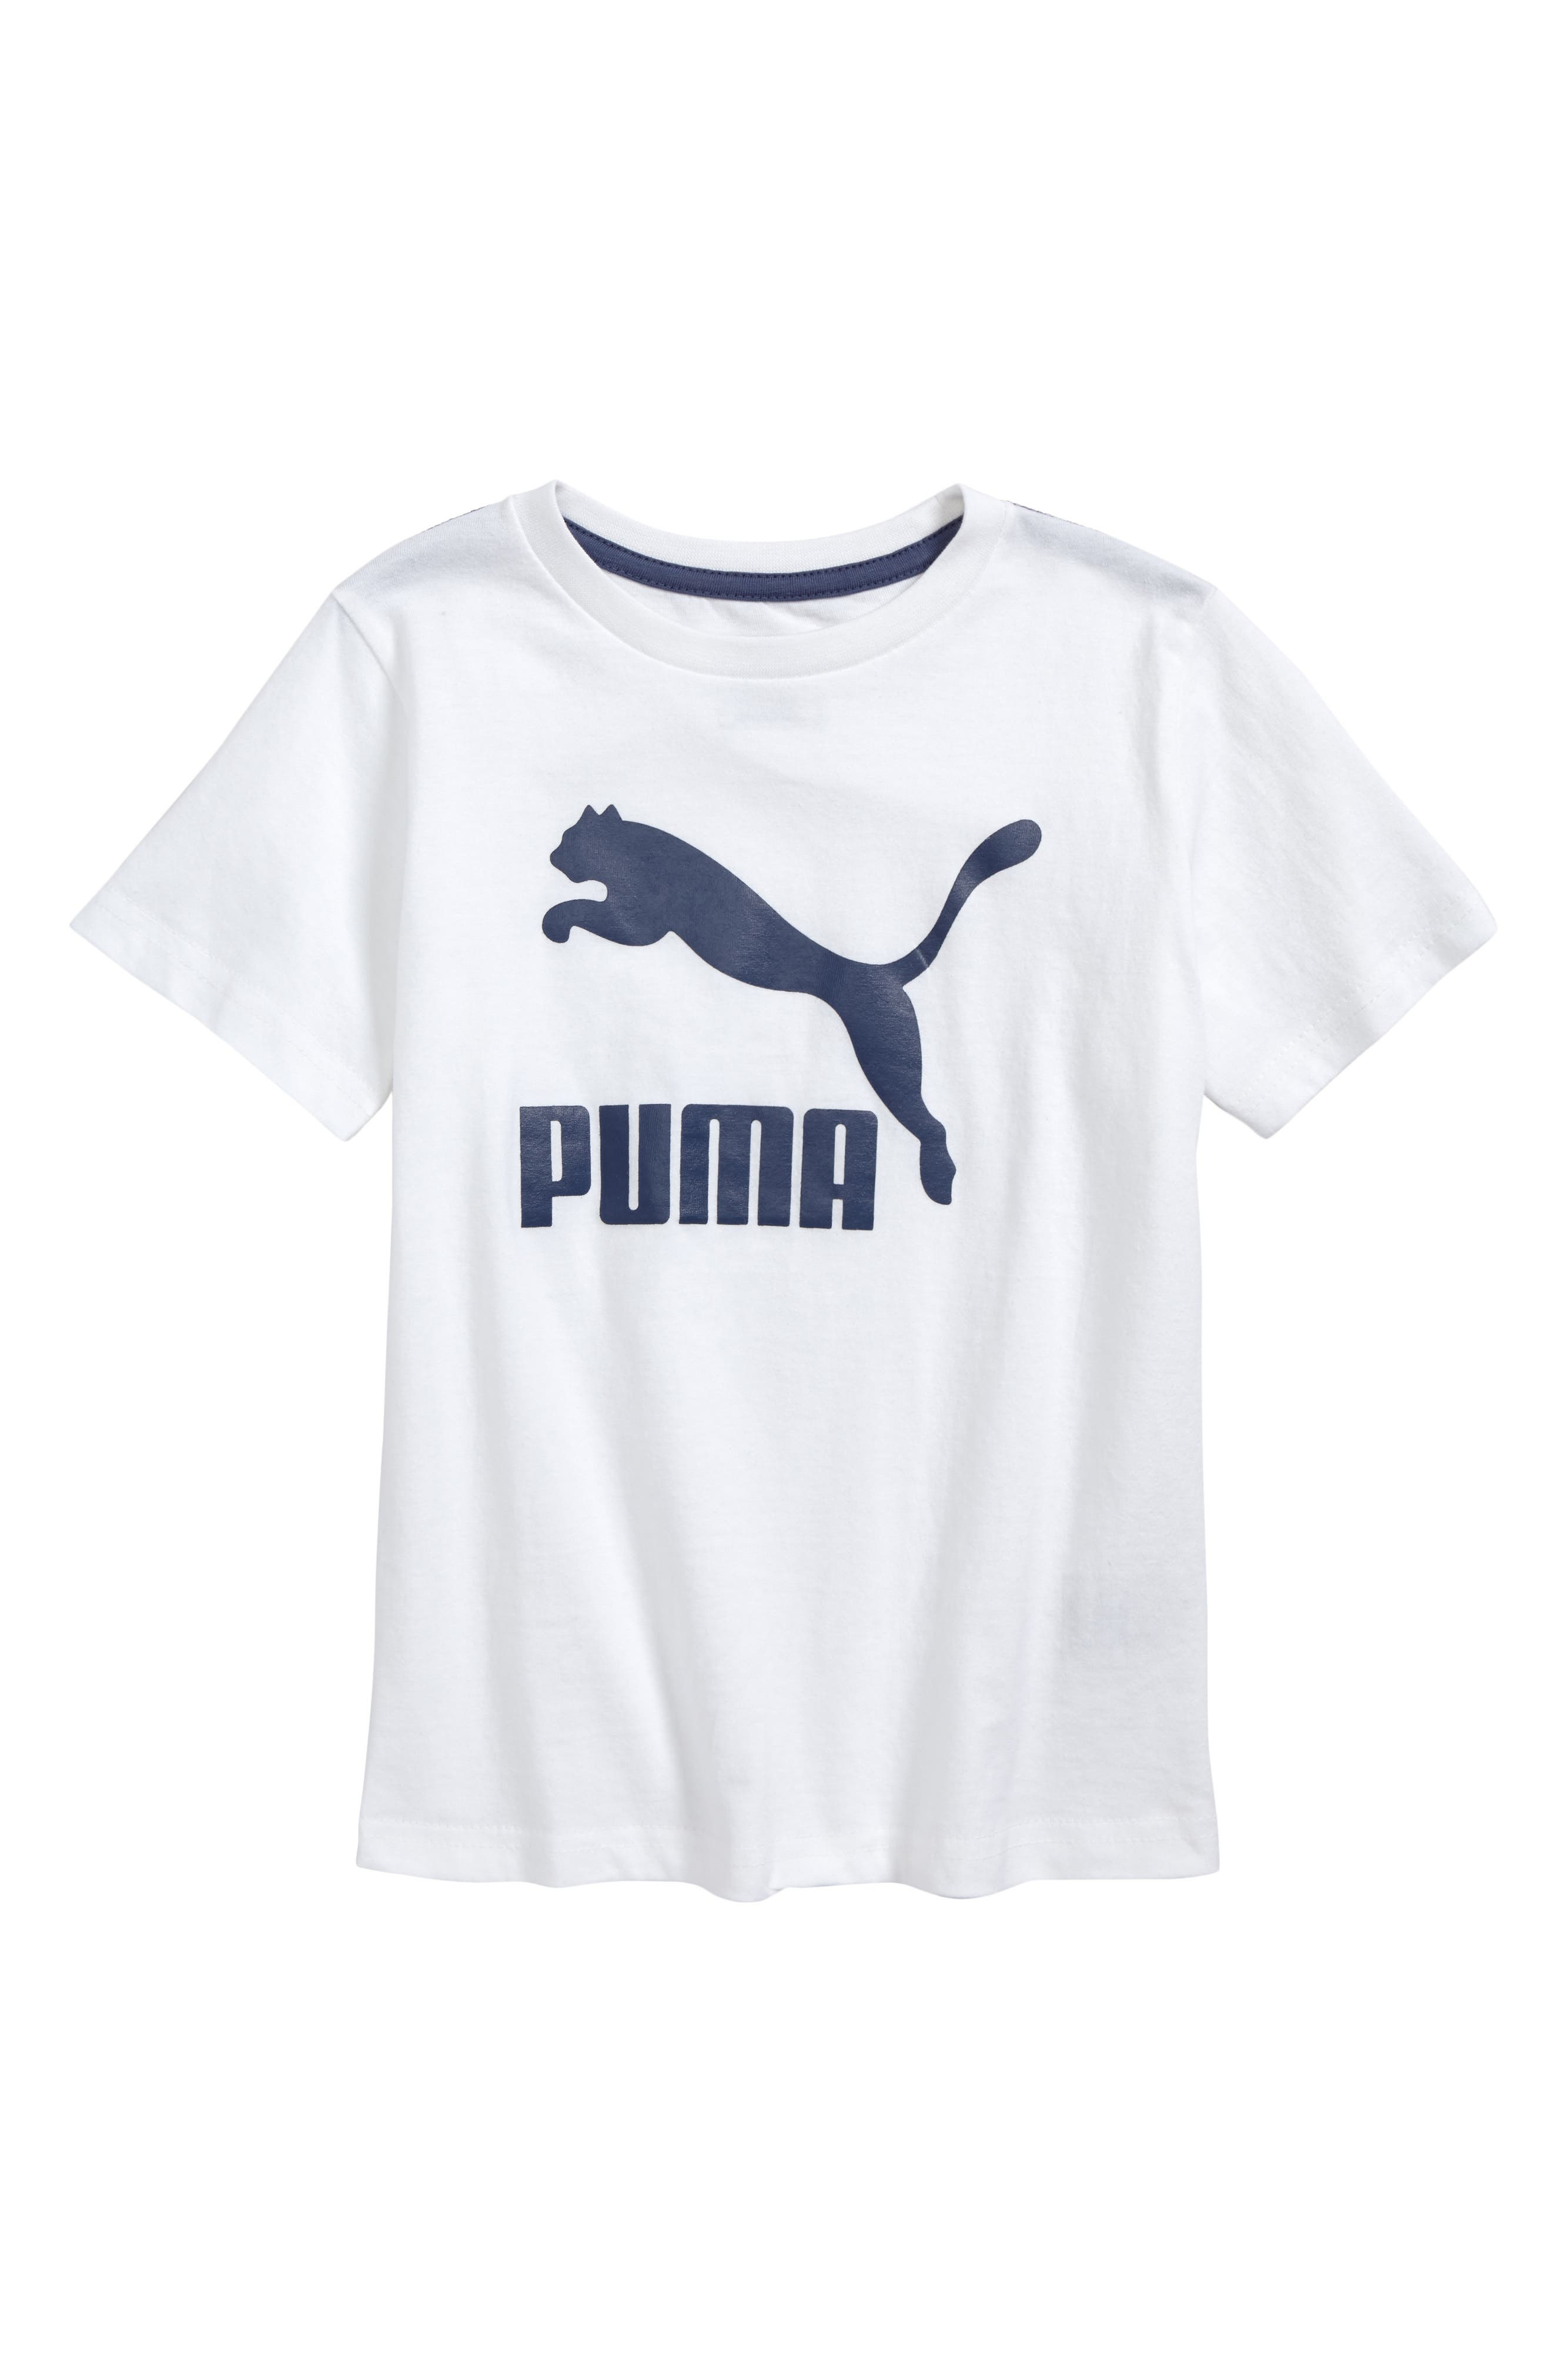 PUMA Logo Graphic T-Shirt (Little Boy)